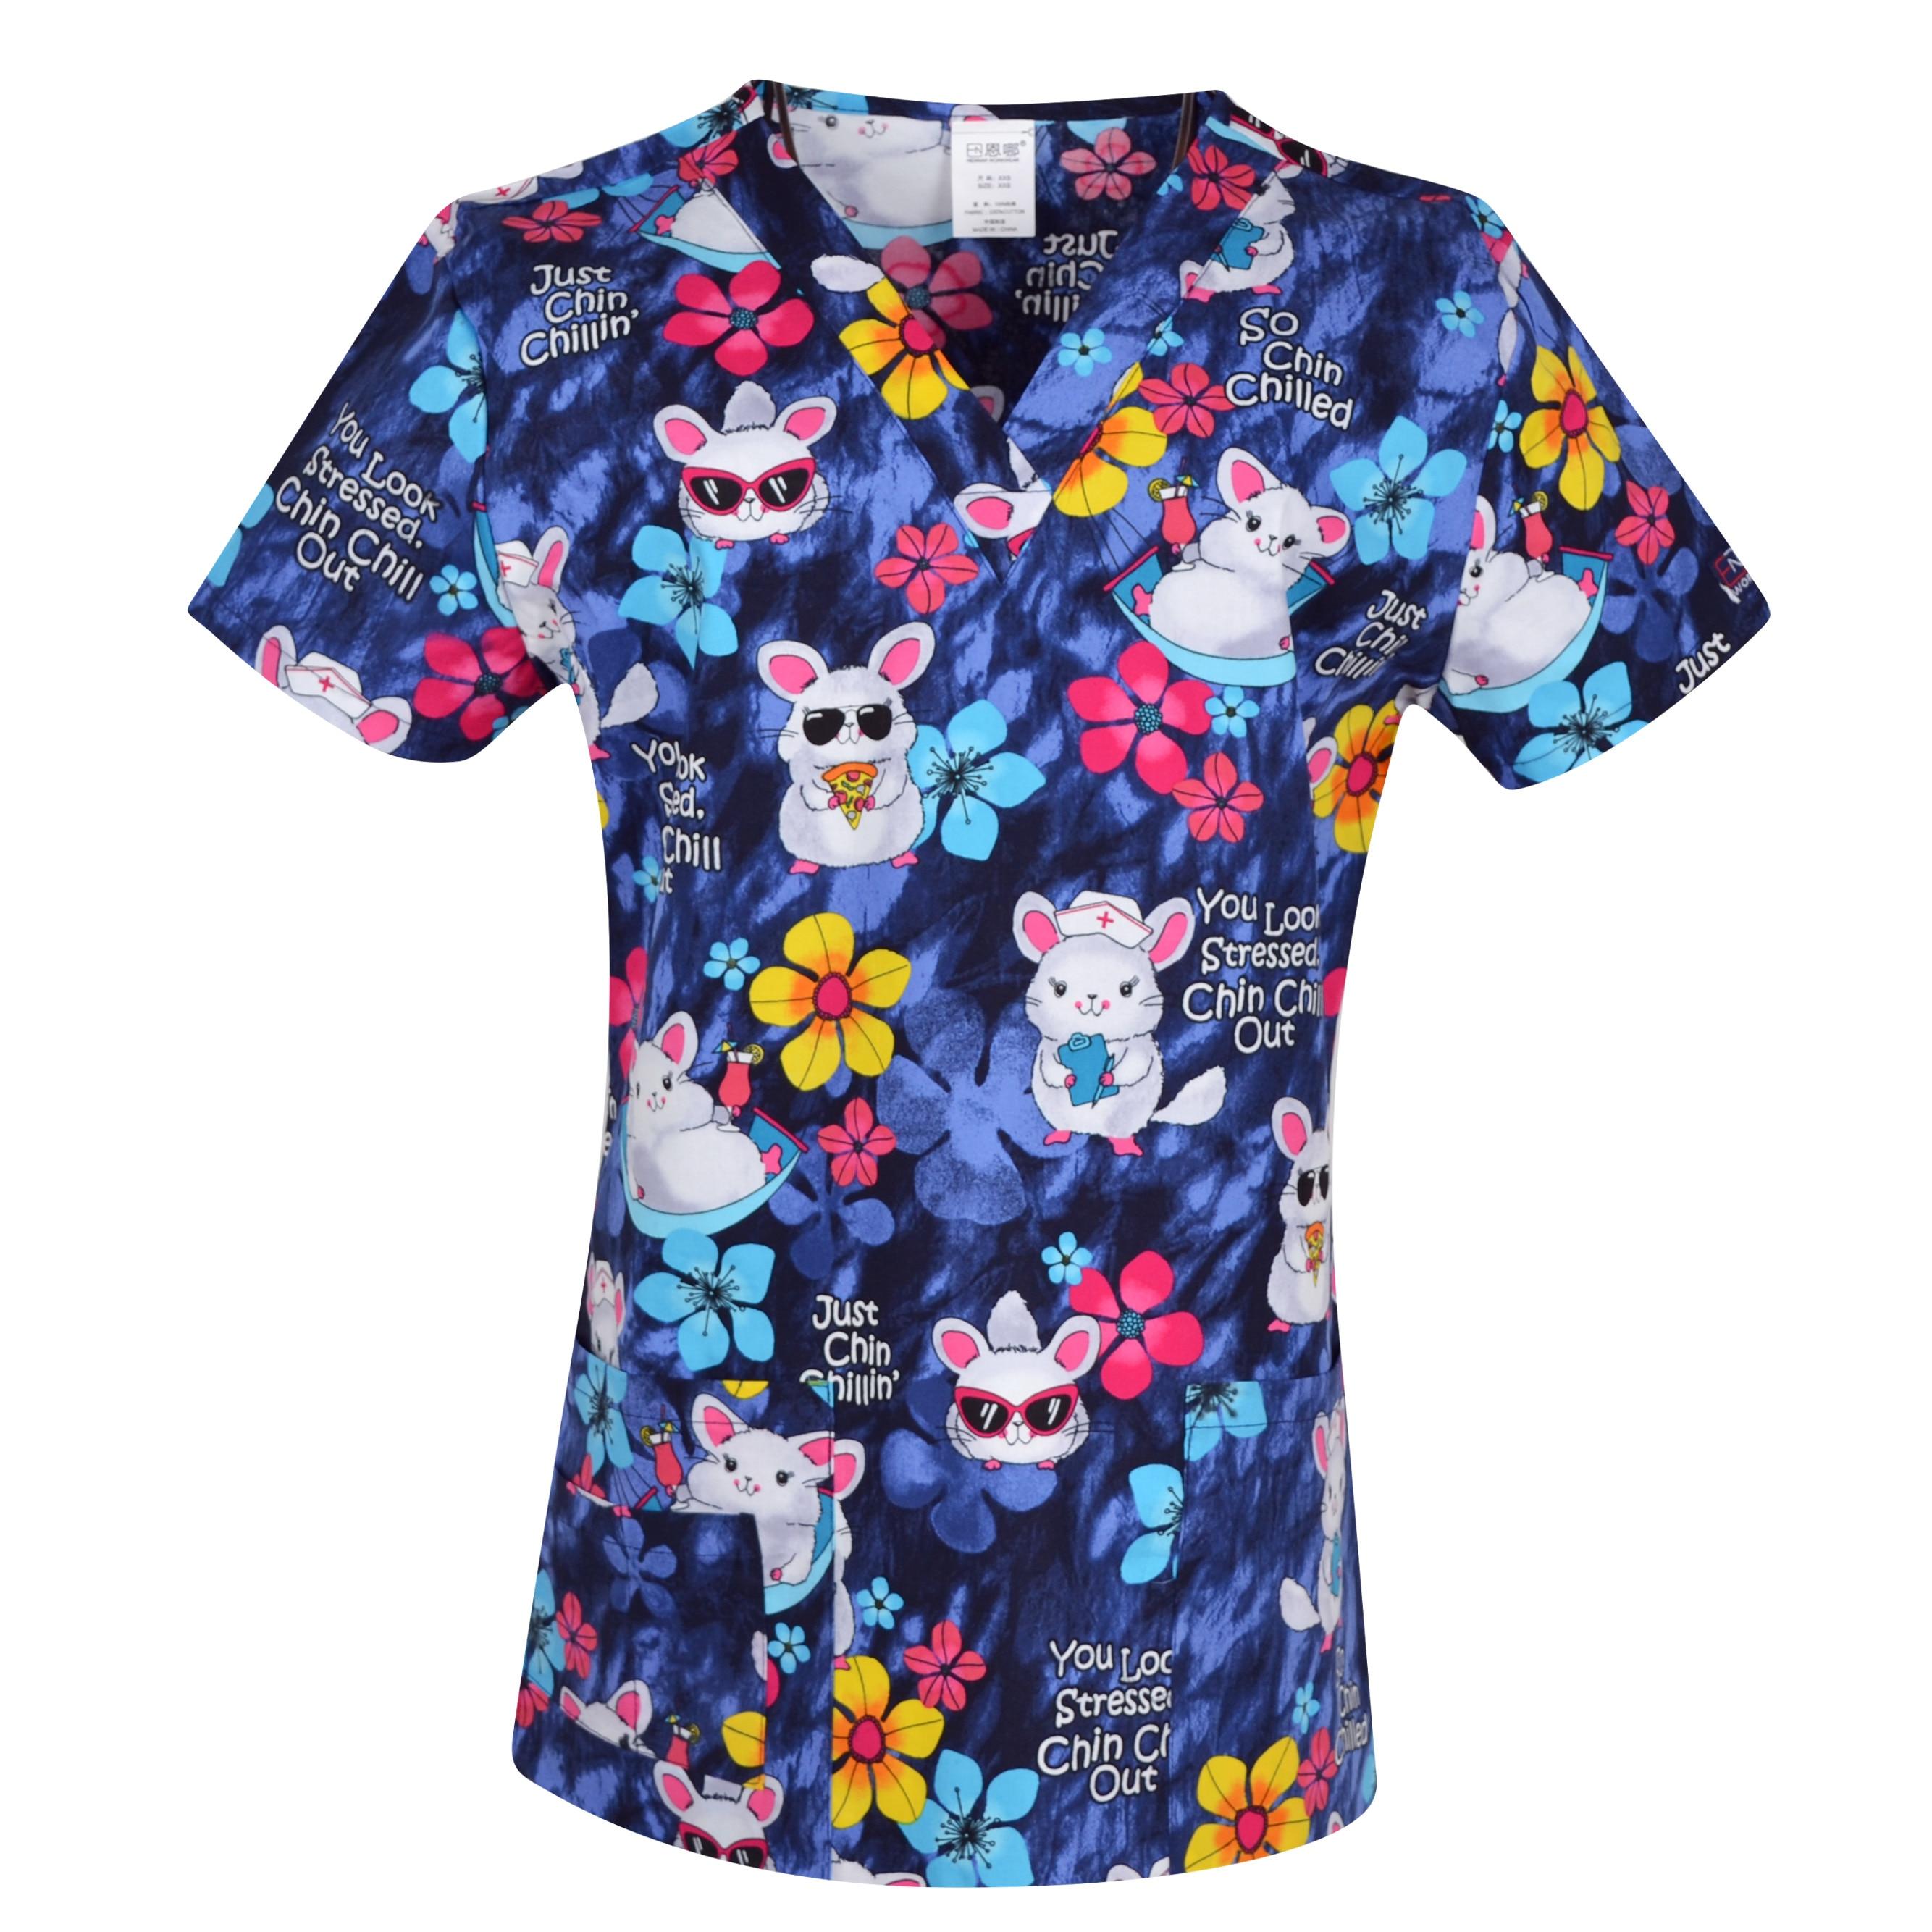 Hennar Women Print Medical Uniform Scrubs Tops Nurse Nursing Clinic Accessories Hospital Medico Clothing  Stretchy Medical Top